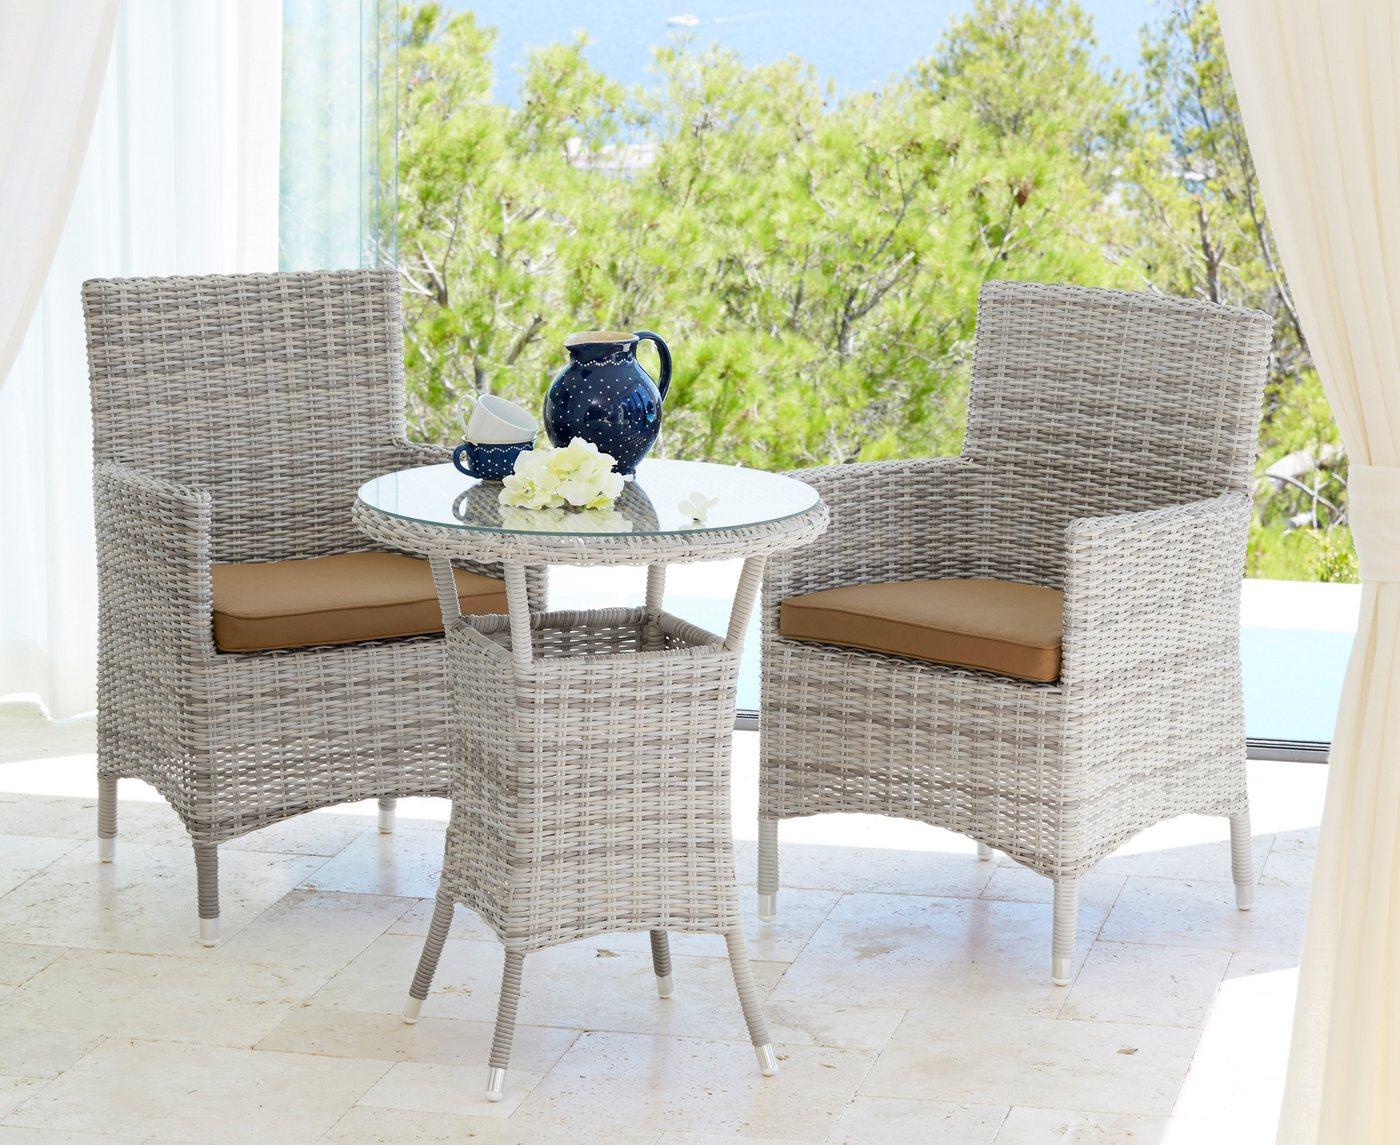 Tuinmeubelset Bali, 2 stoelen, 1 tafel Ø 60 cm, poly-rotan, wolwit